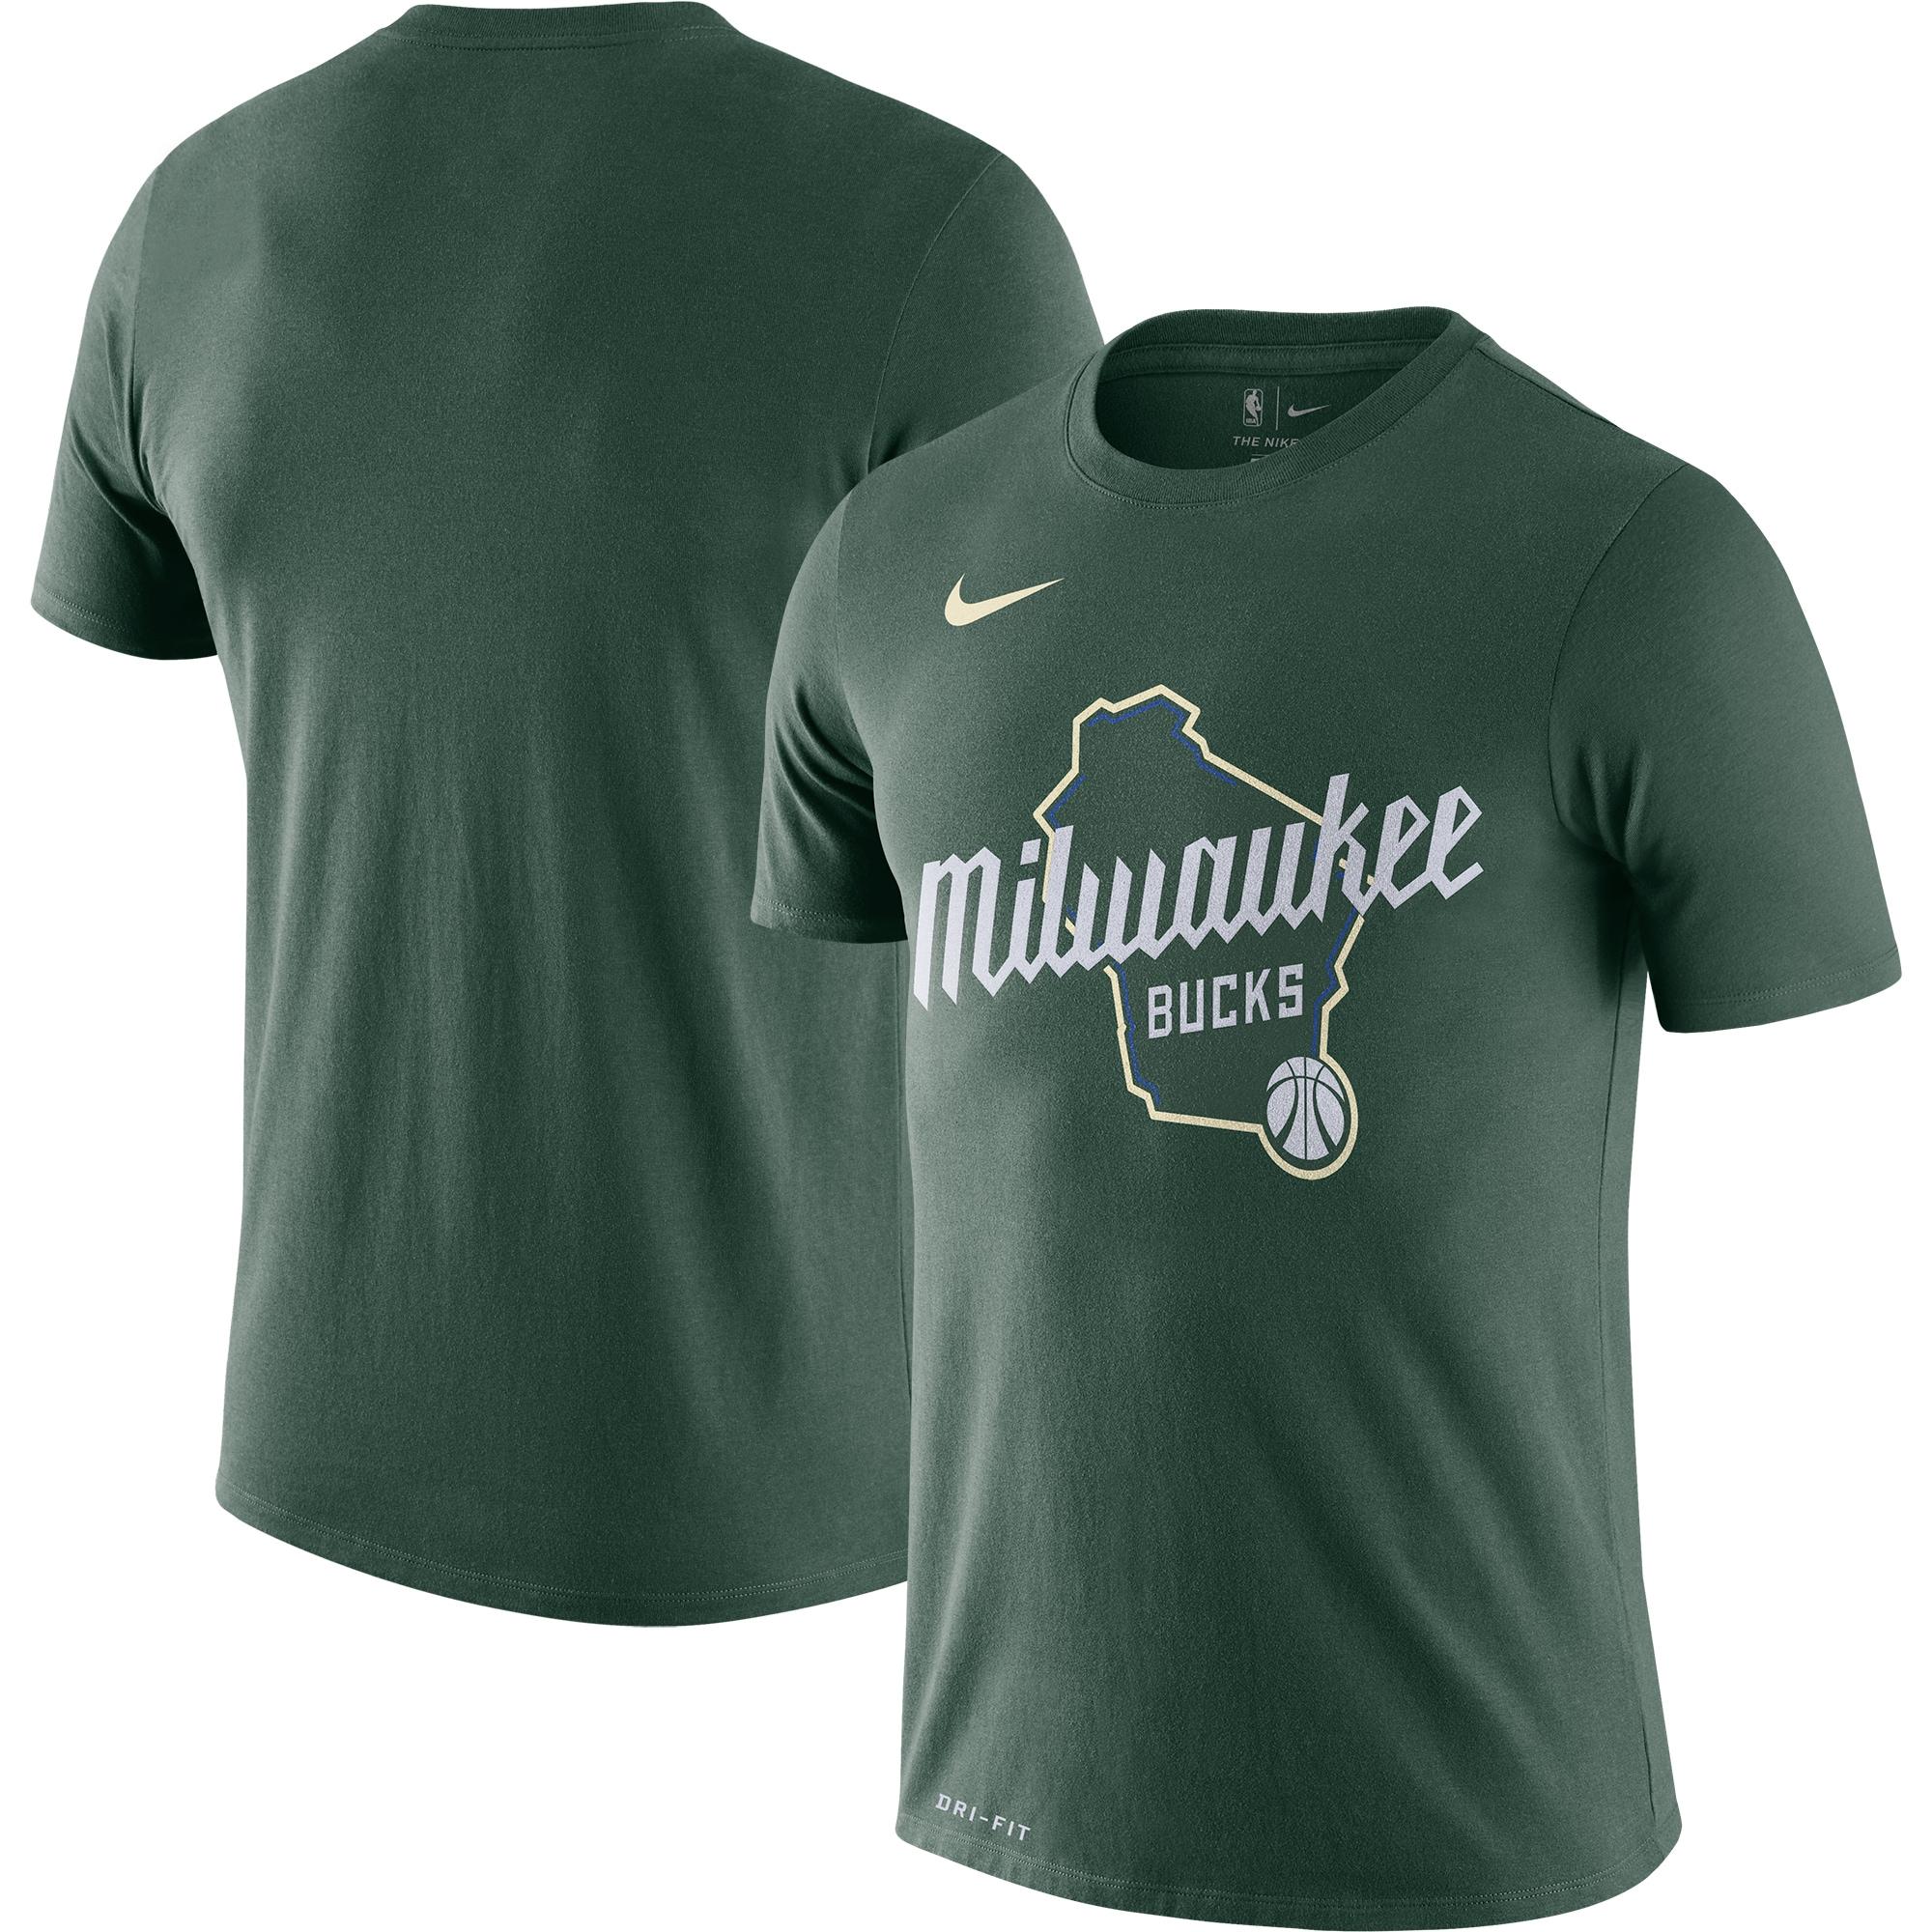 Milwaukee Bucks Nike 2019/20 City Edition Hometown Performance T-Shirt - Green